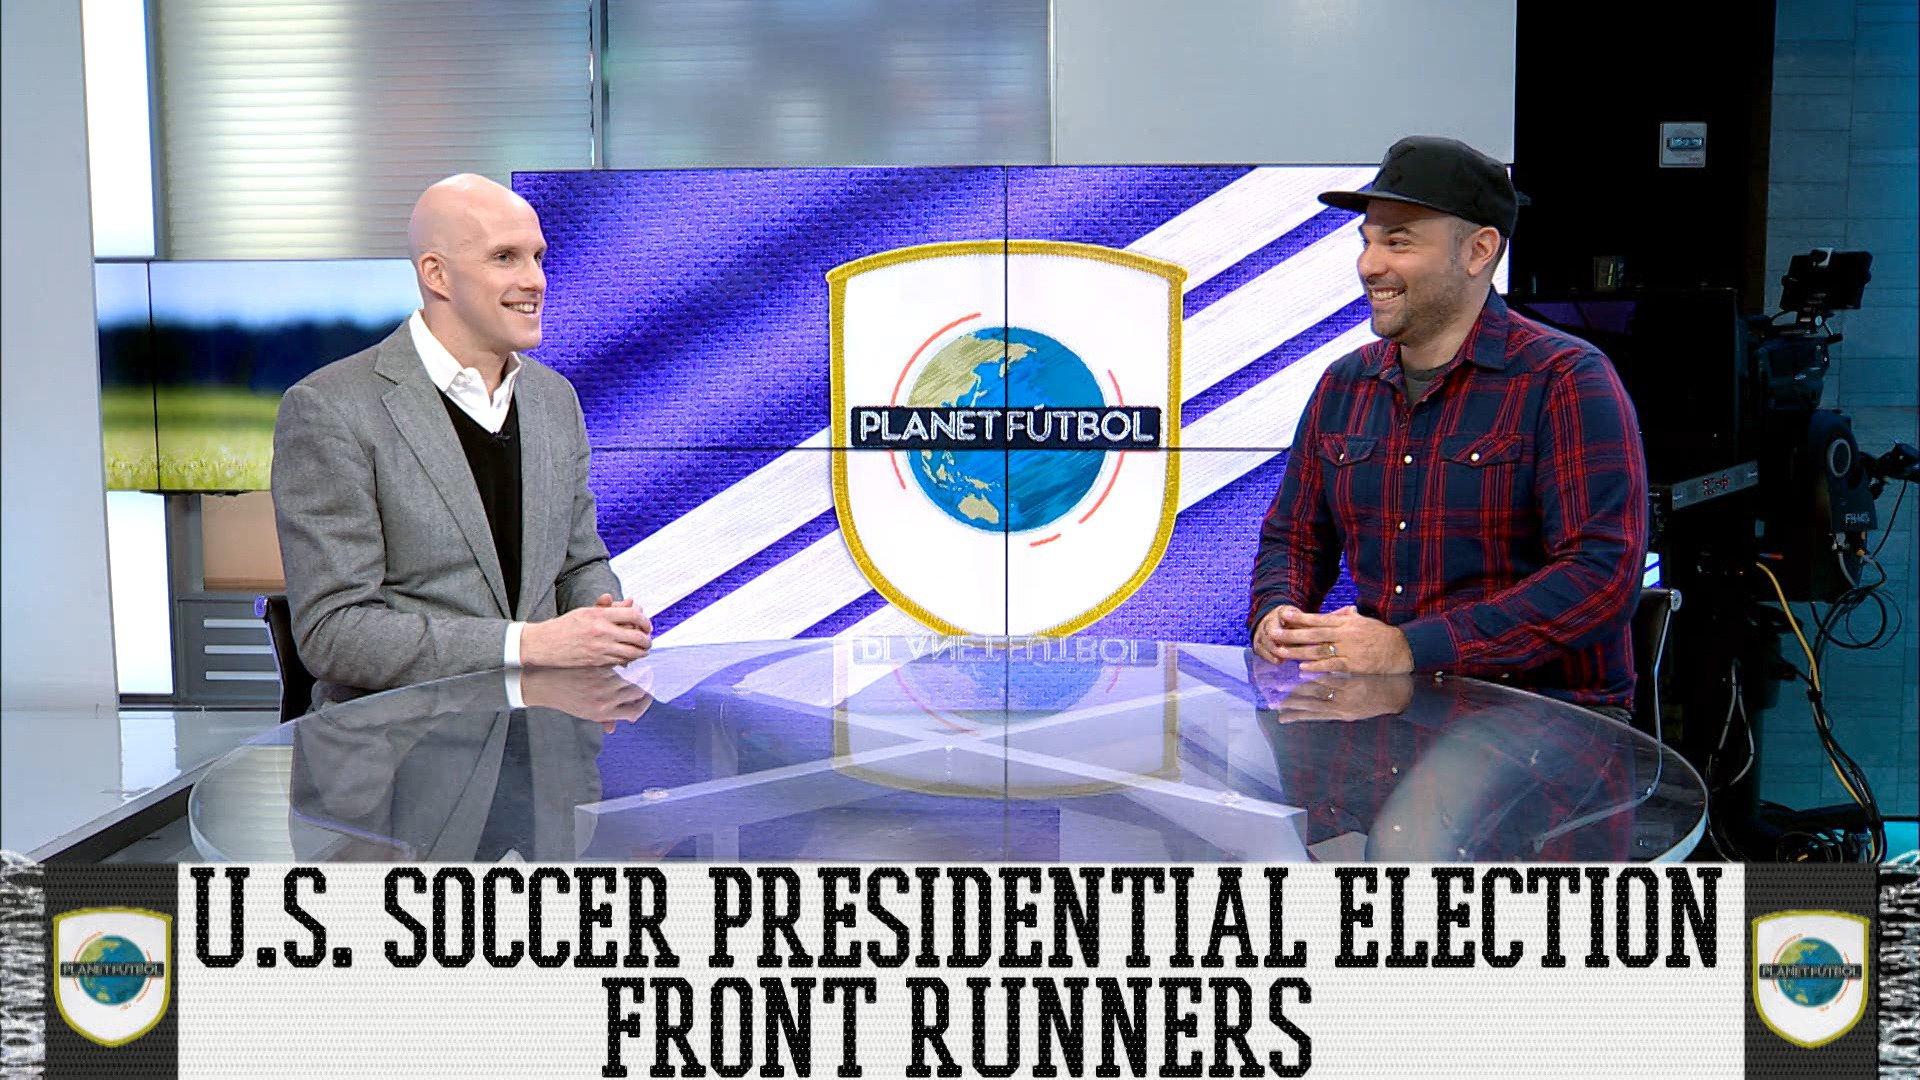 96ab863be Amazon.com: Watch Planet Fútbol | Prime Video